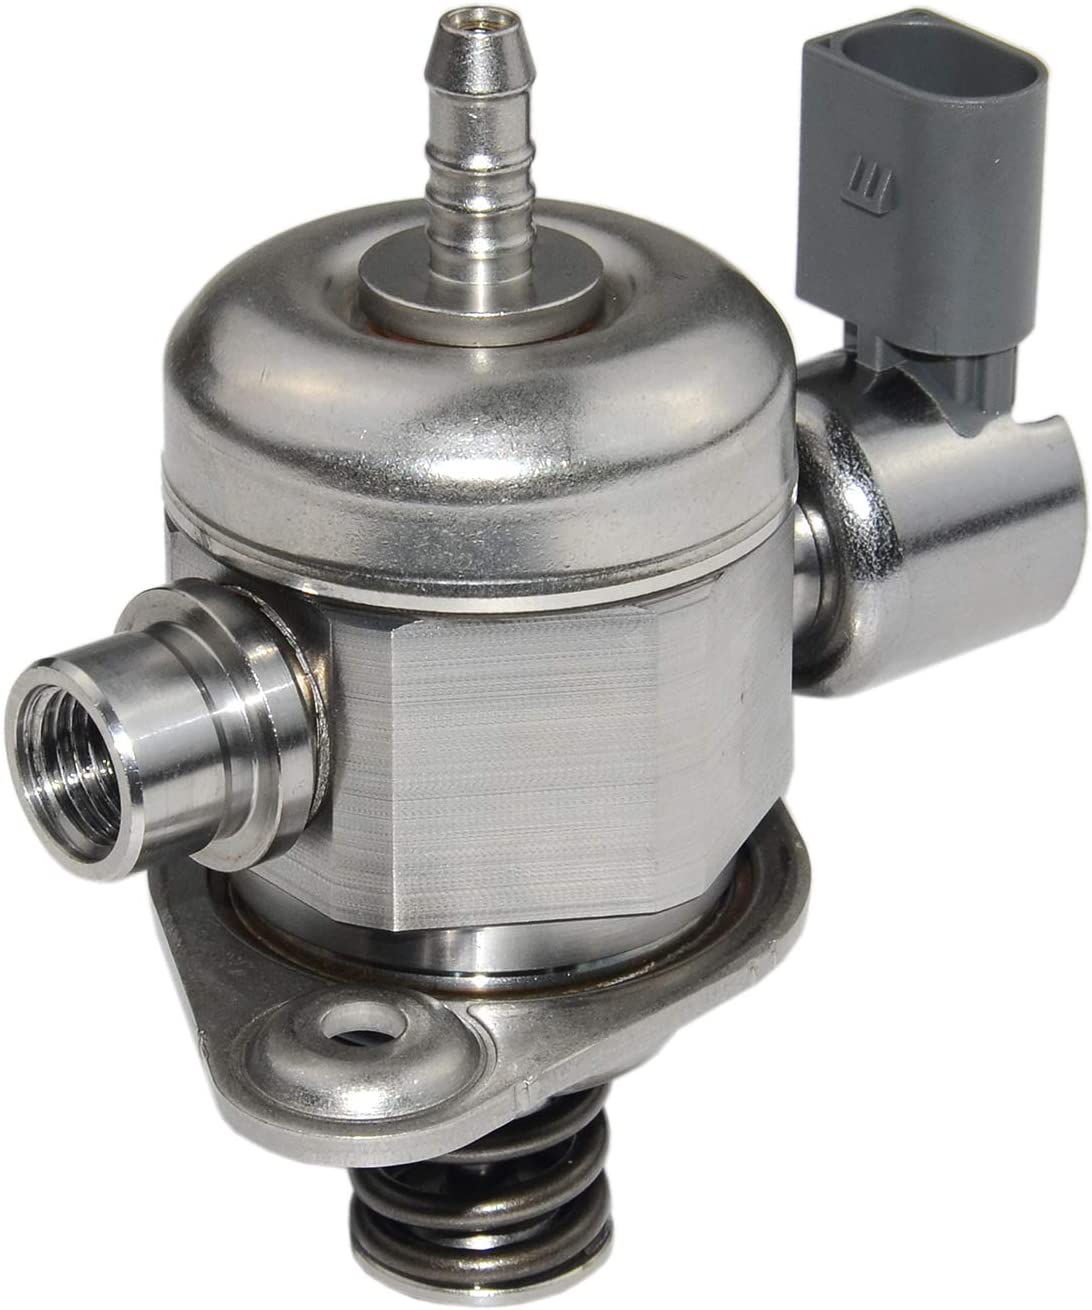 High Pressure Fuel Pump For Au di Q3 2012-2014 2.0TFSI CCTA 06H 127 025 D